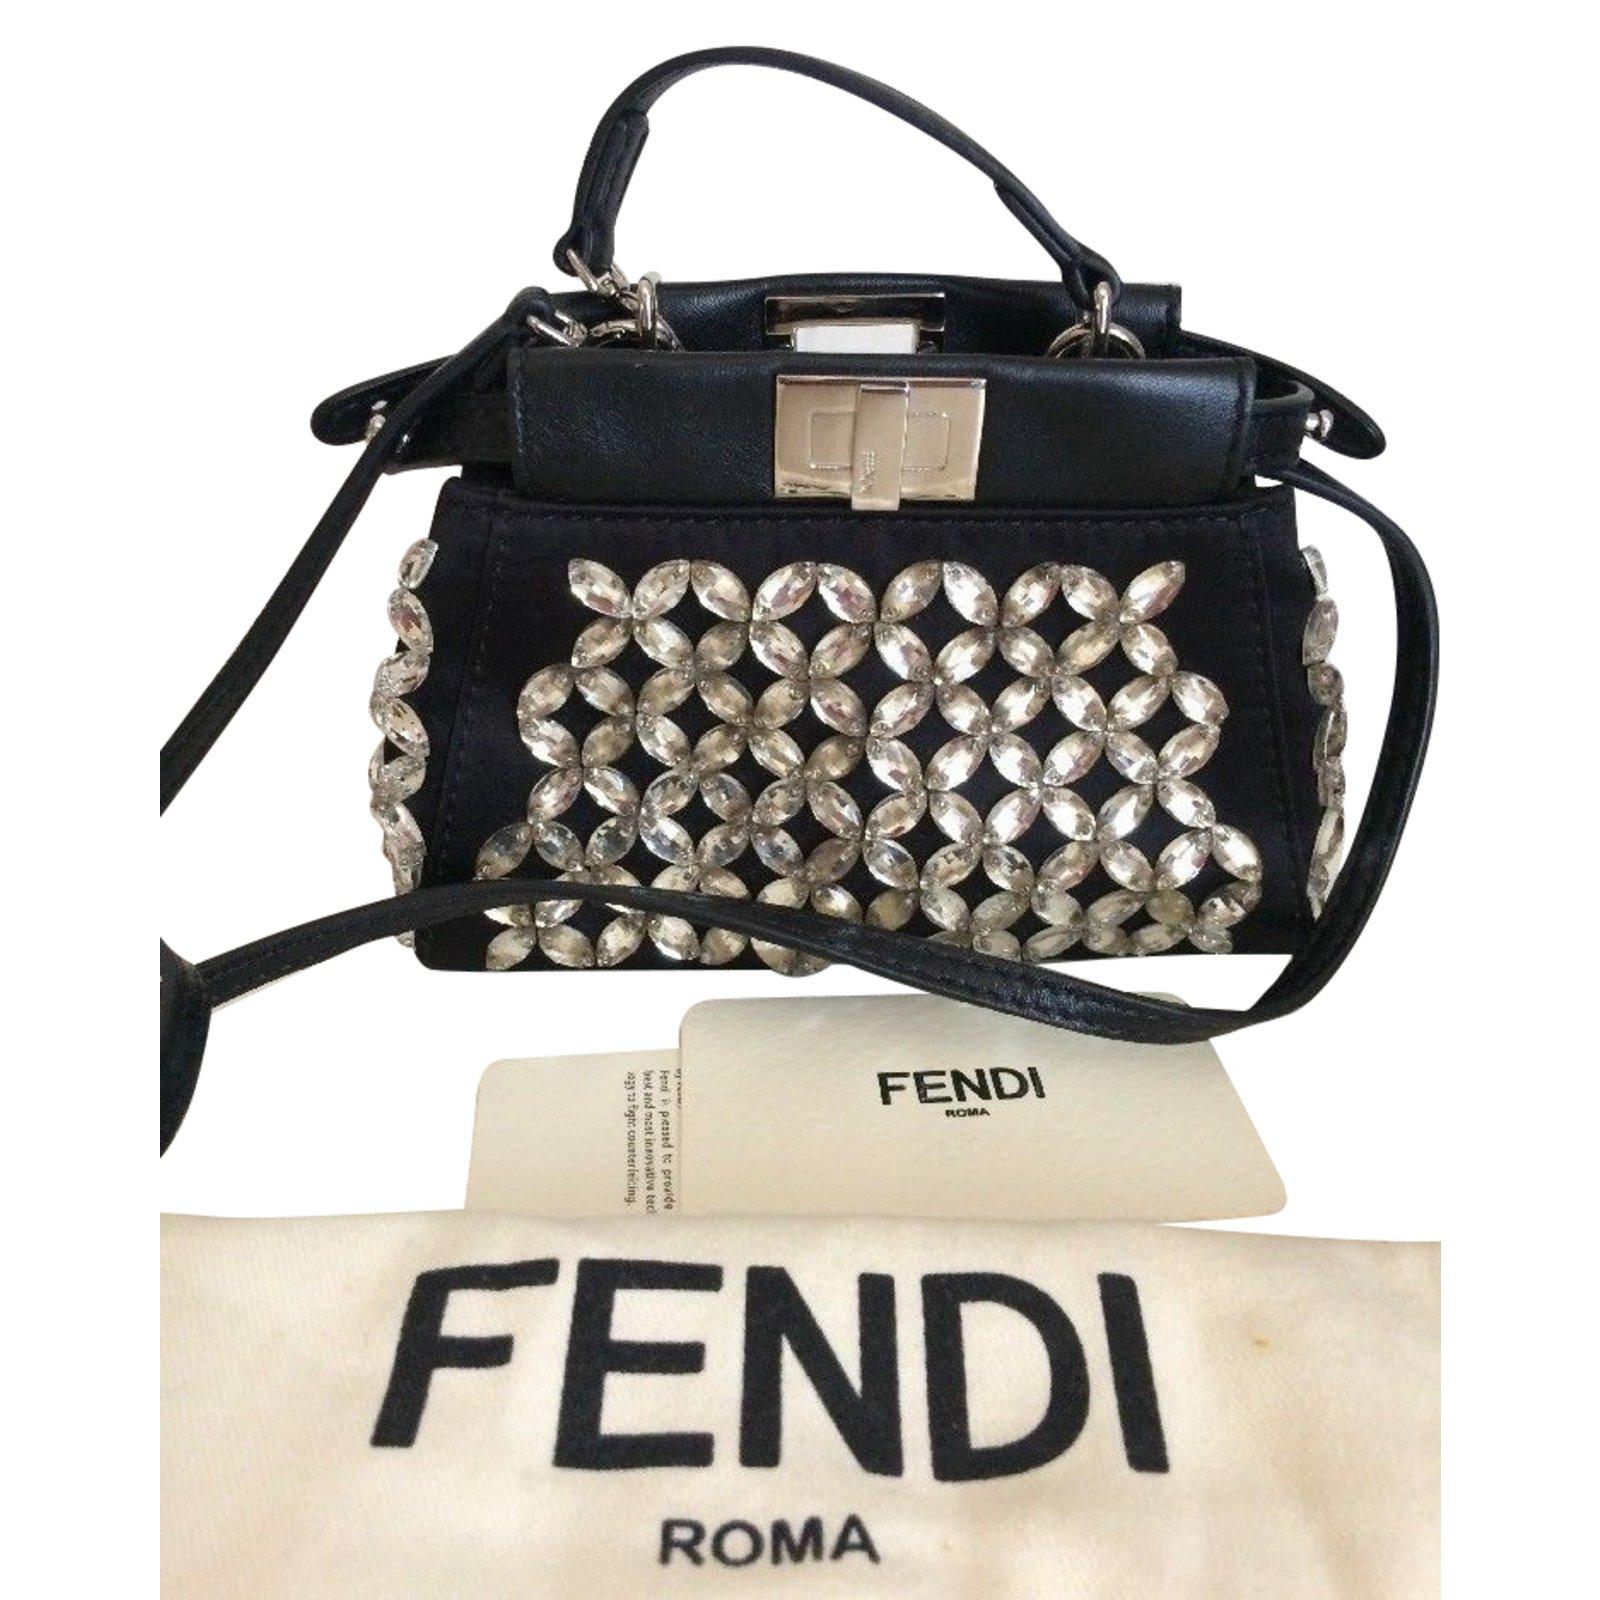 ... authentic fendi micro peekaboo crystal handbags leathersatin black ref.76857  8cd28 e11cd ... 6181addae5baf